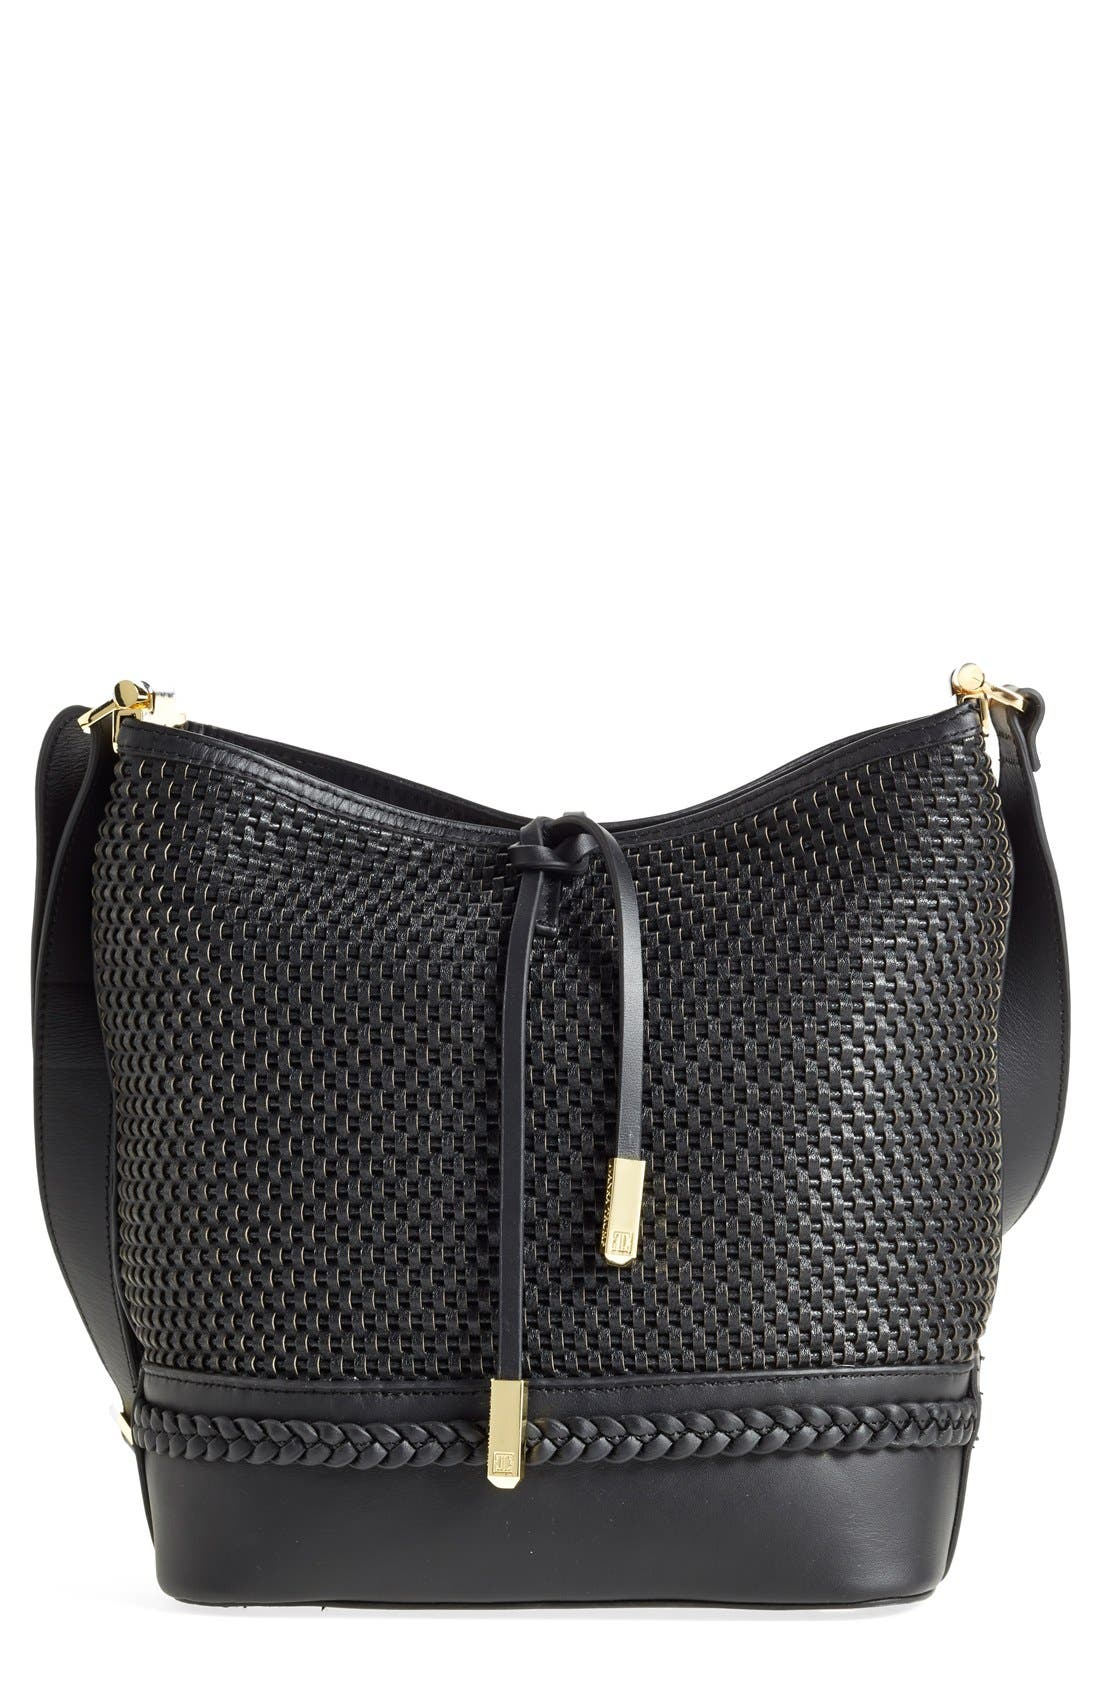 Main Image - Ivanka Trump 'Briarcliff' Woven Leather Bucket Bag